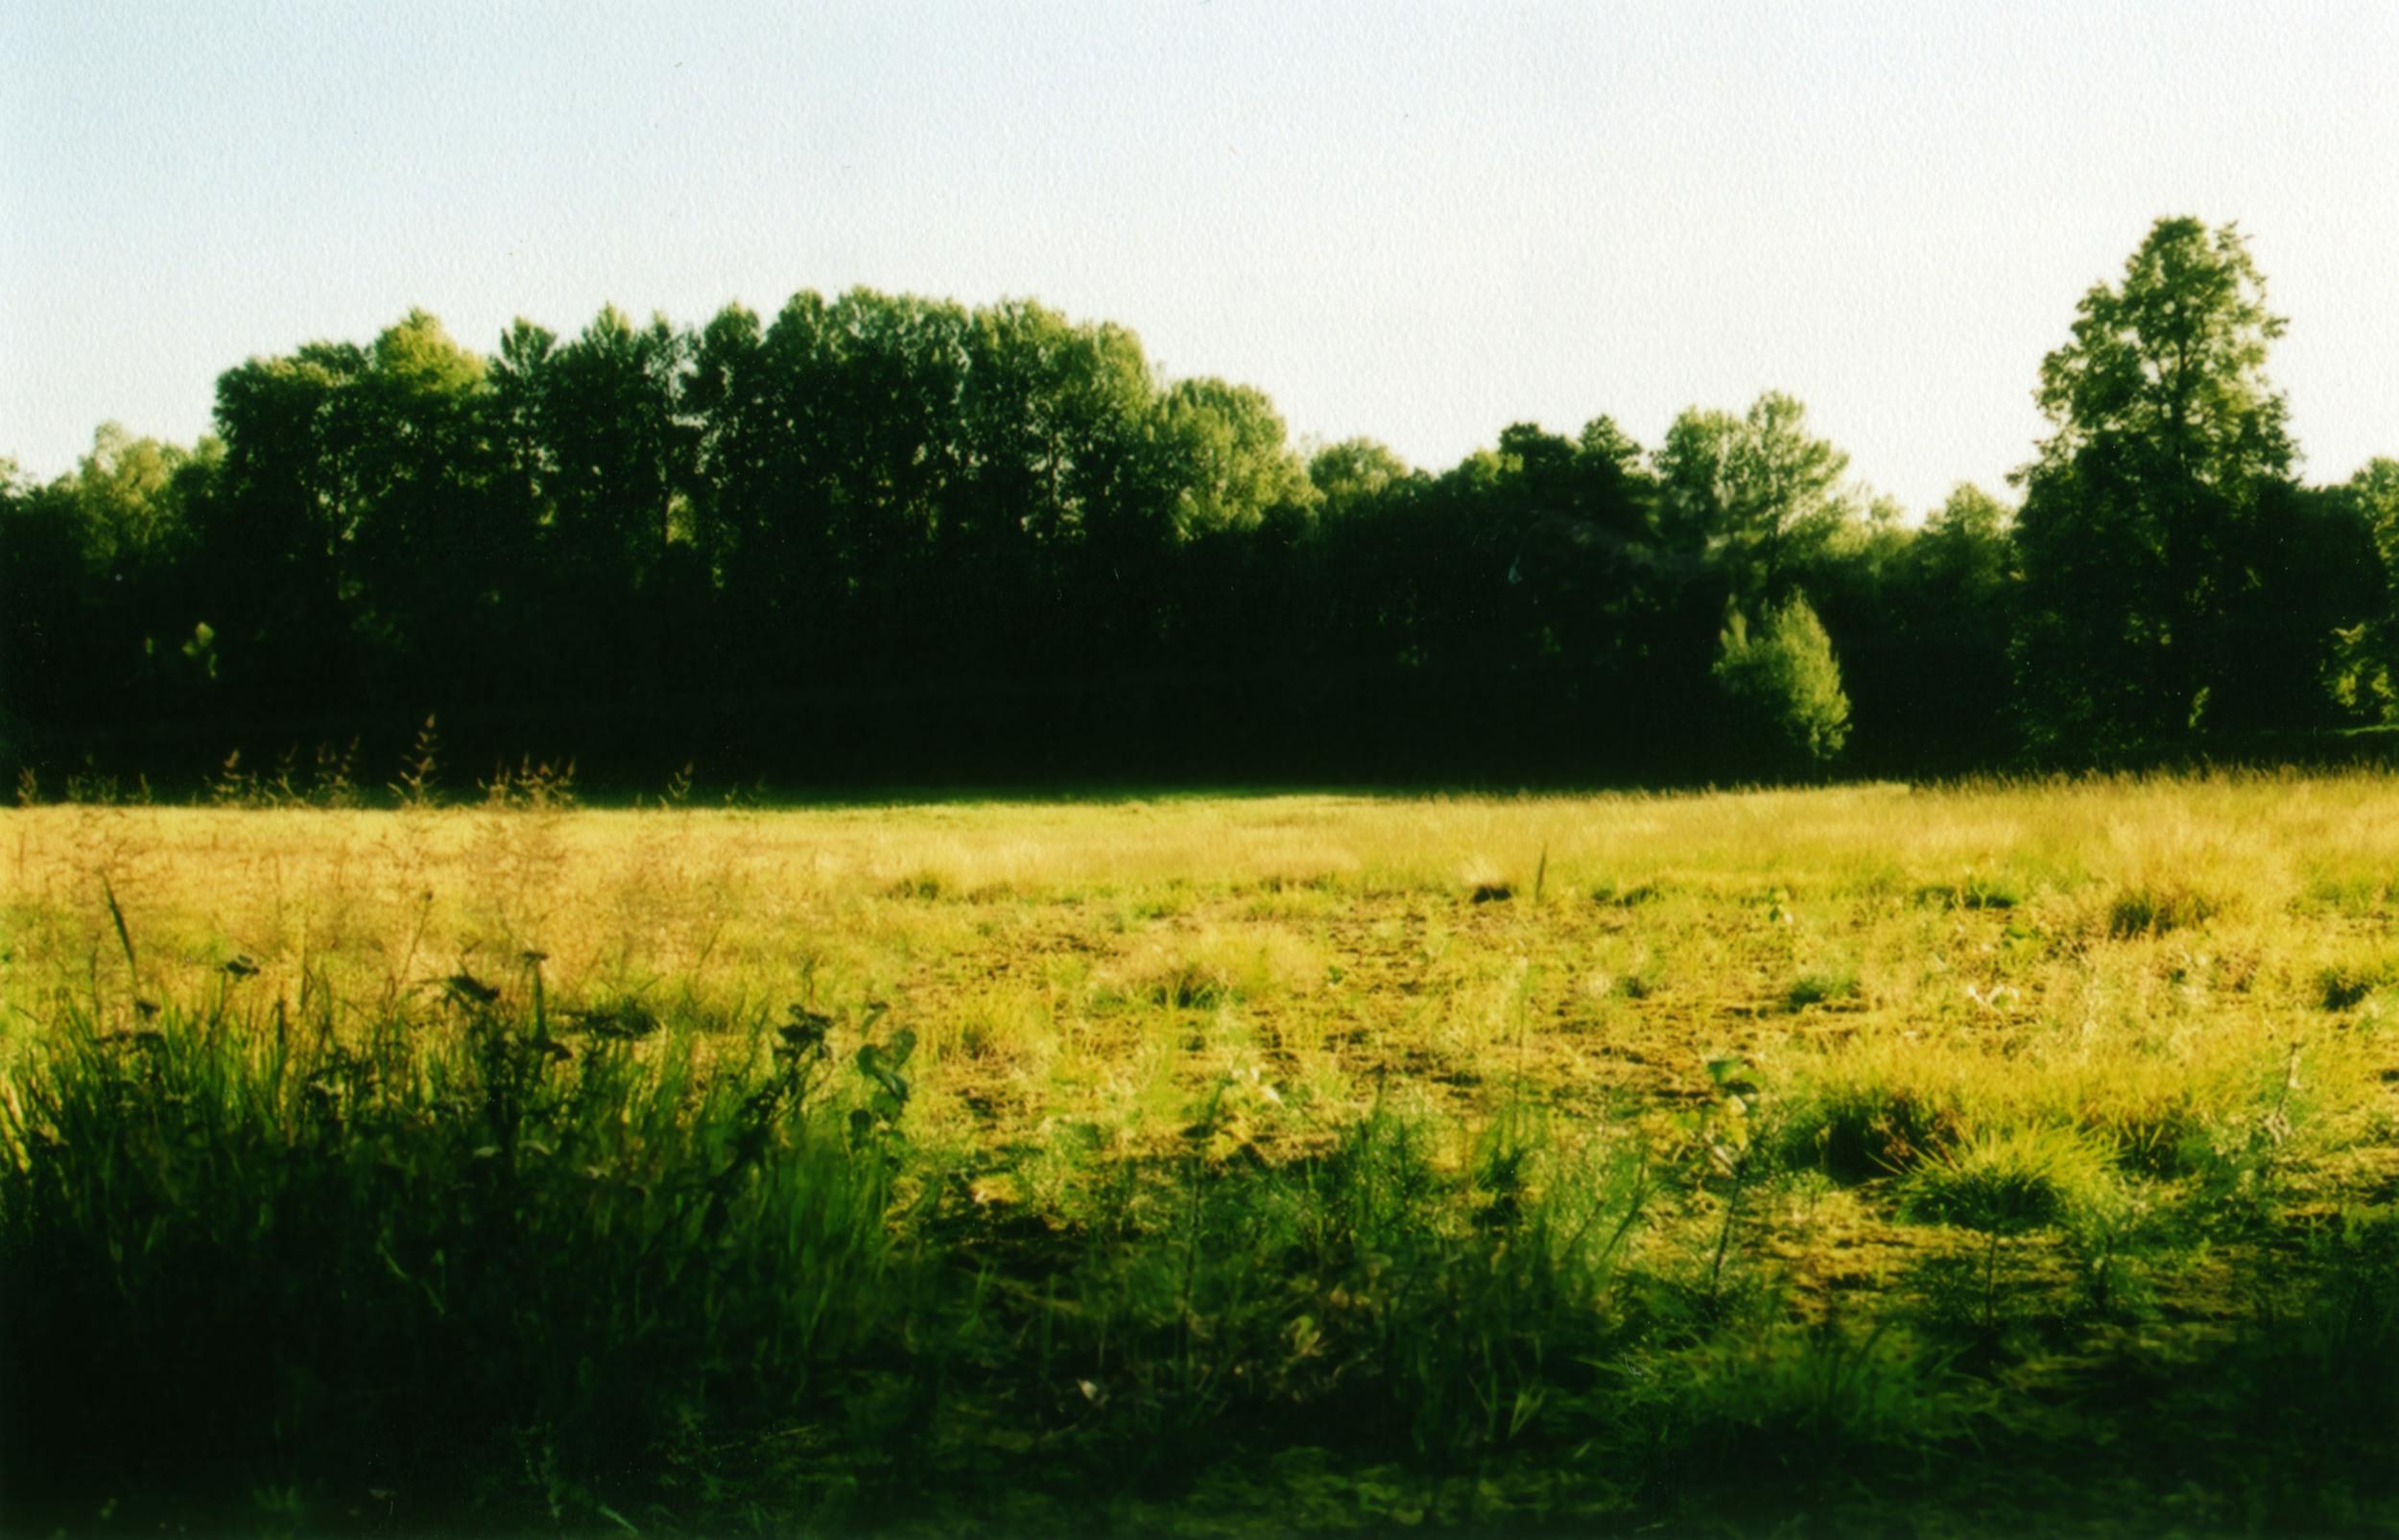 Image 15.jpg